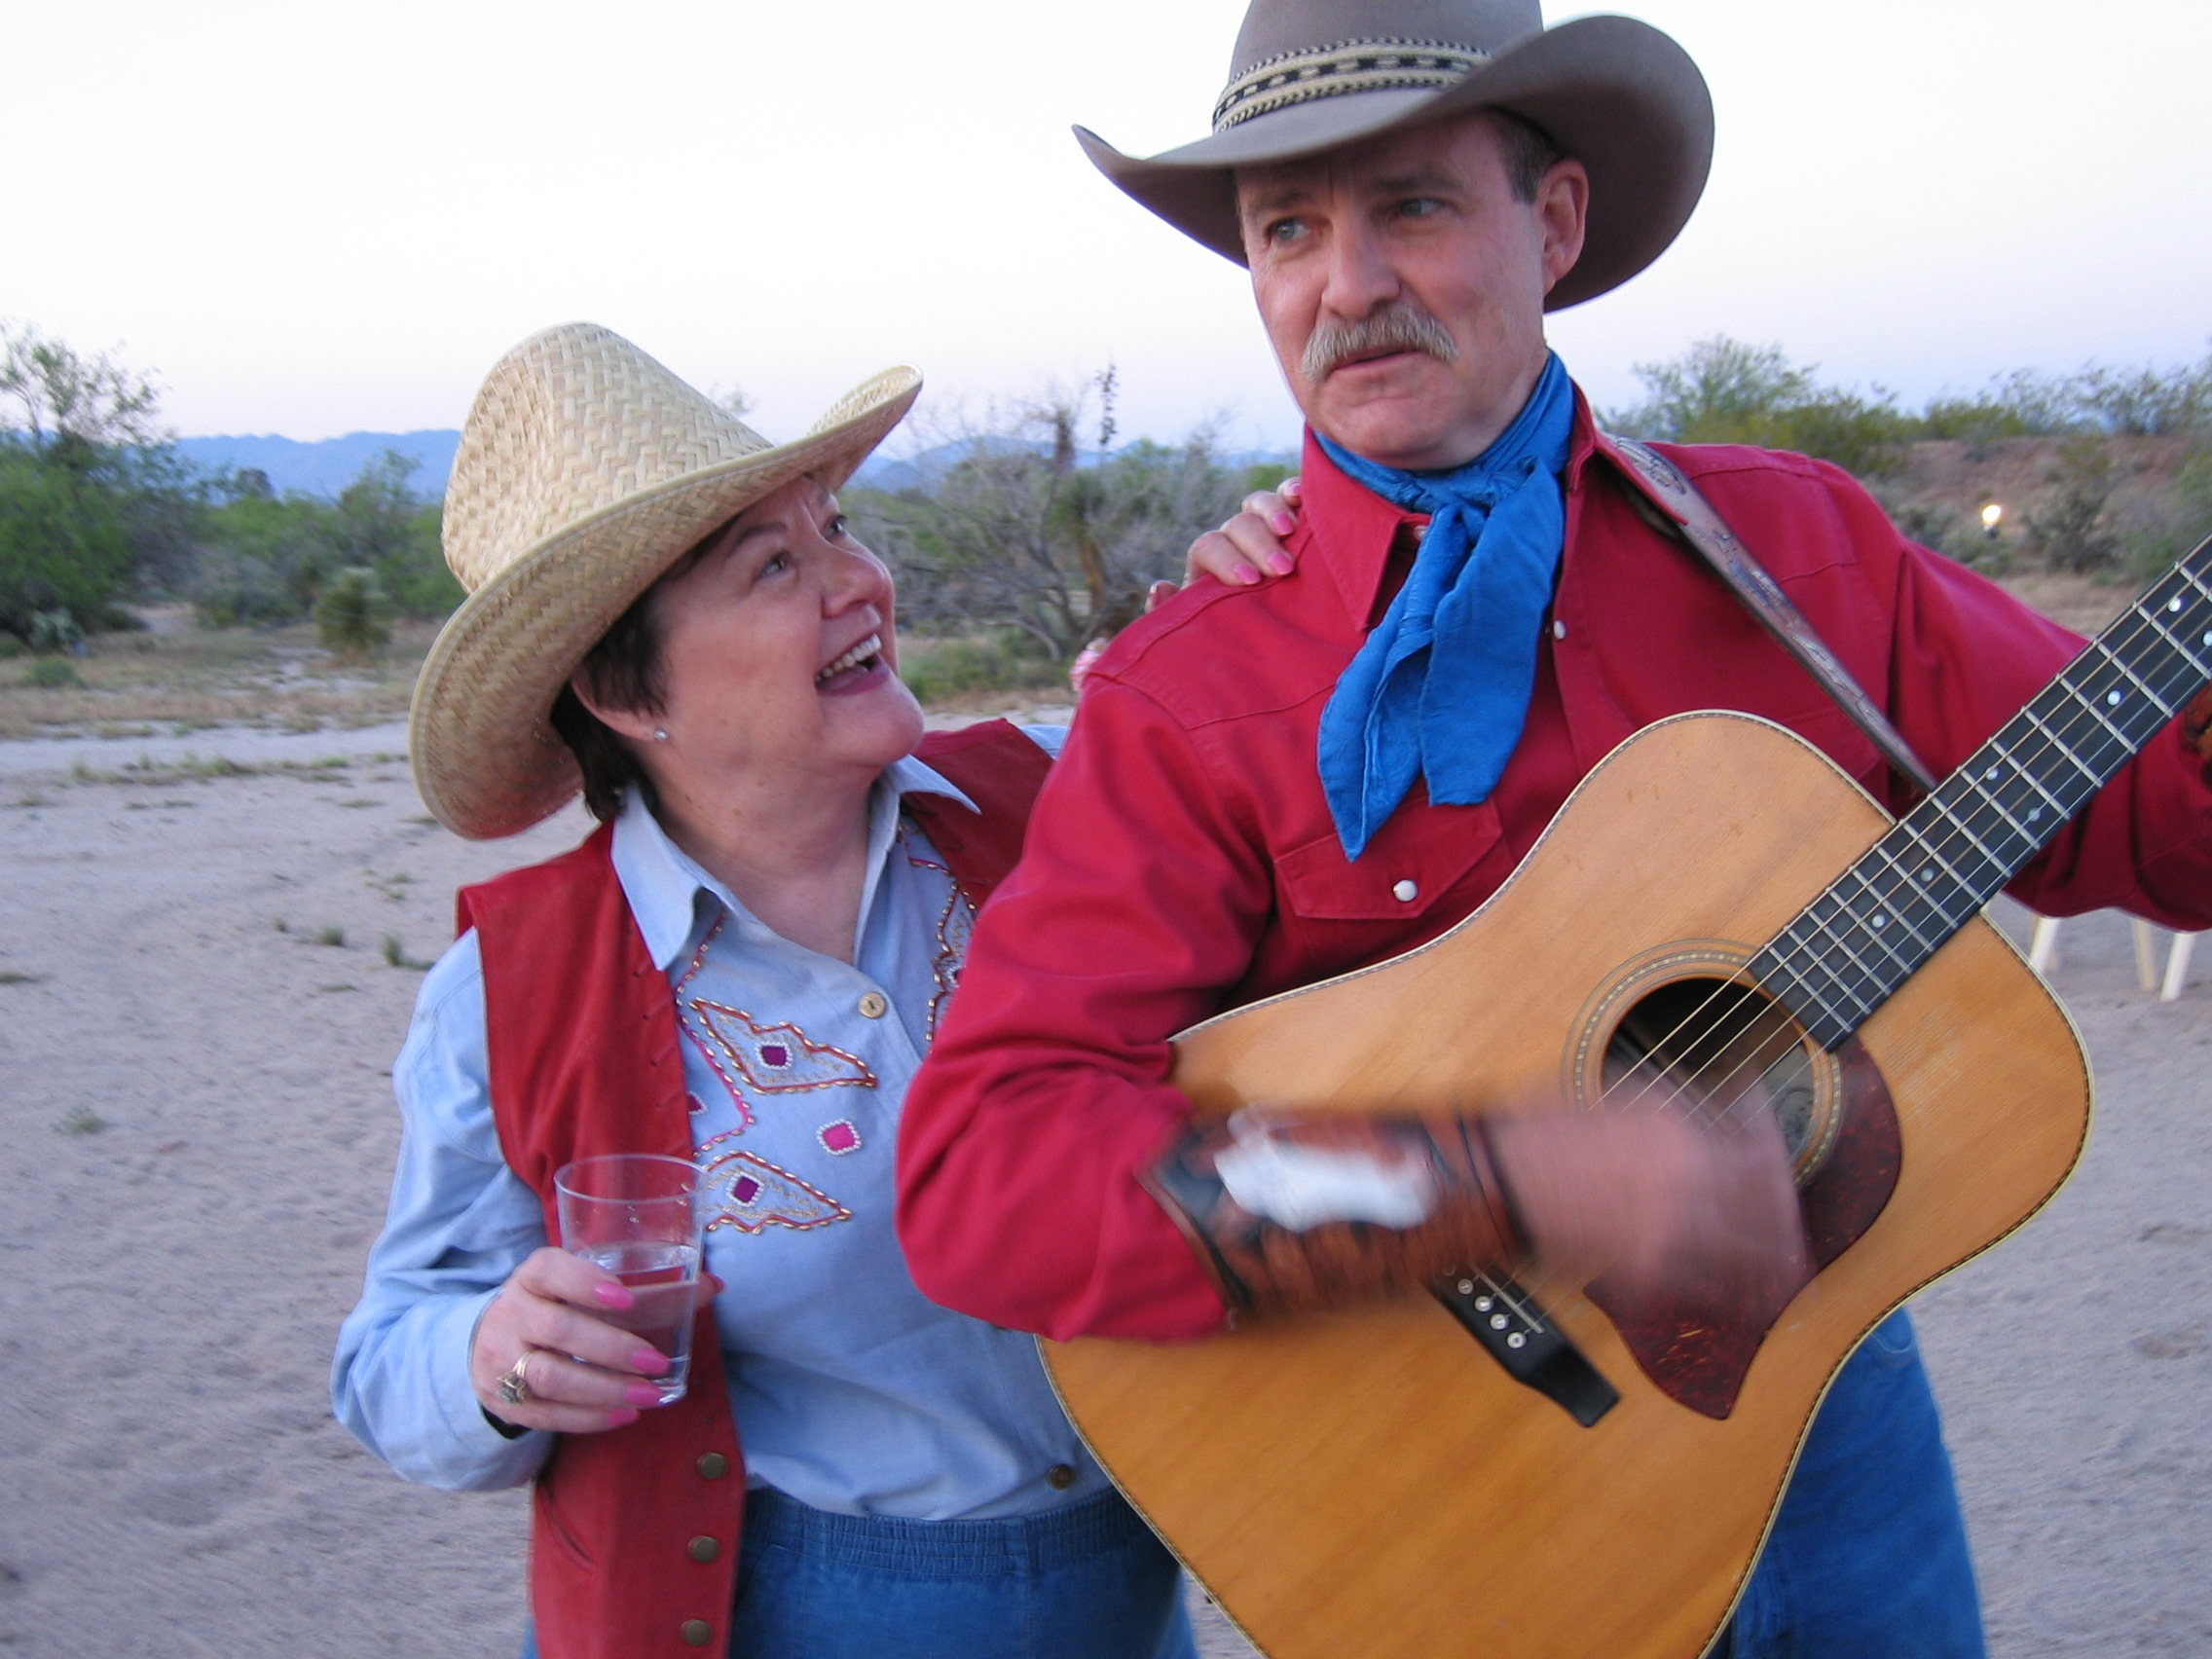 Reggie nabs the singing cowboy